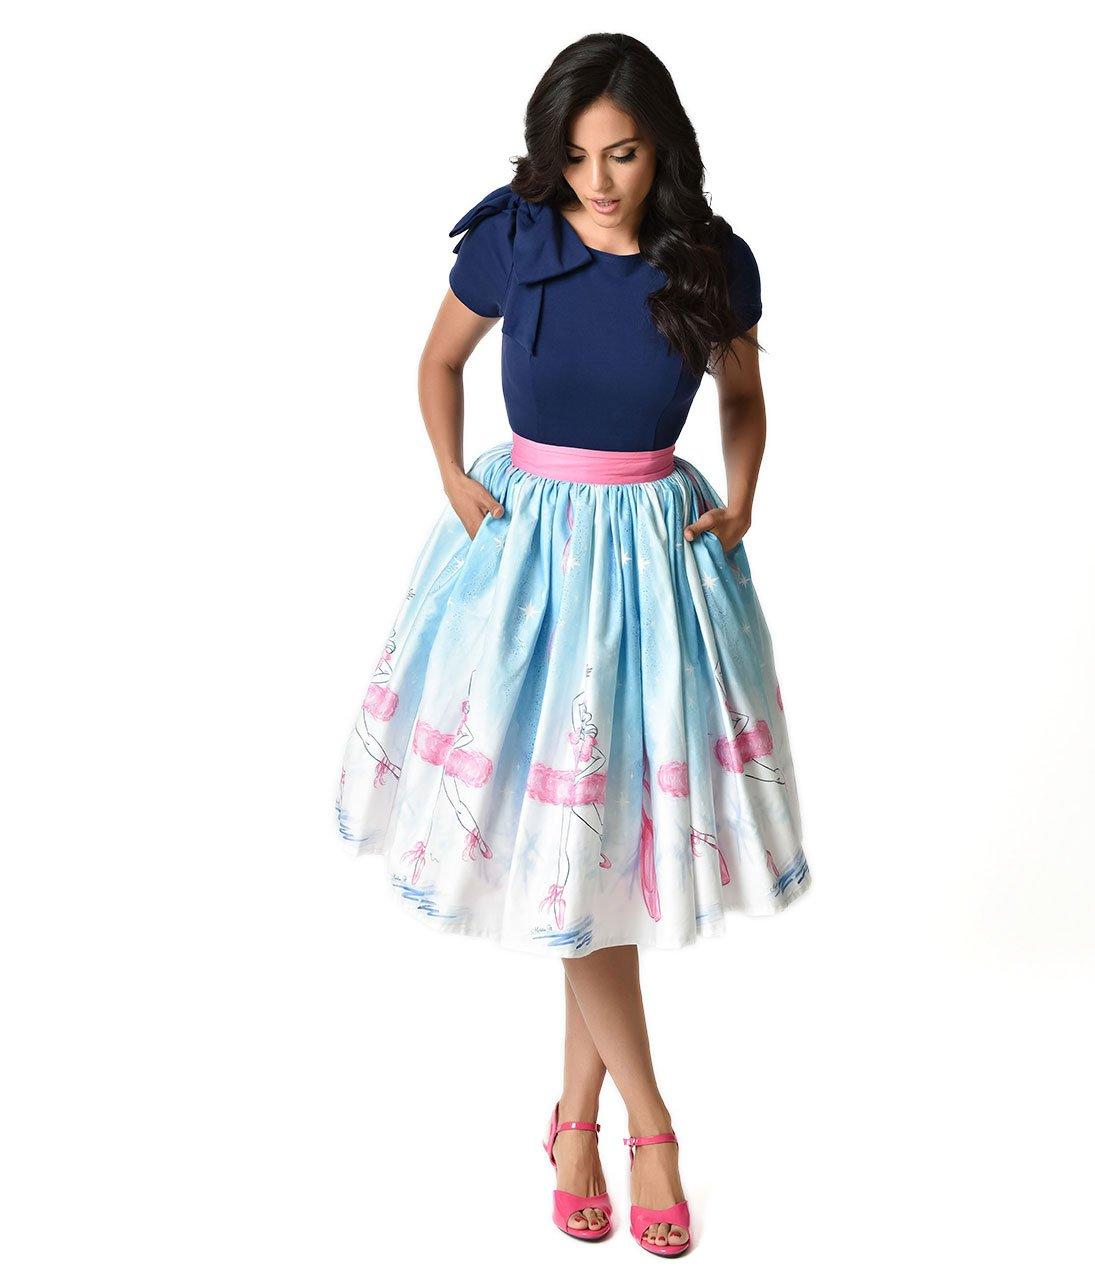 Unique Vintage Micheline Pitt 1950s Style Vintage Ballerina Skirt